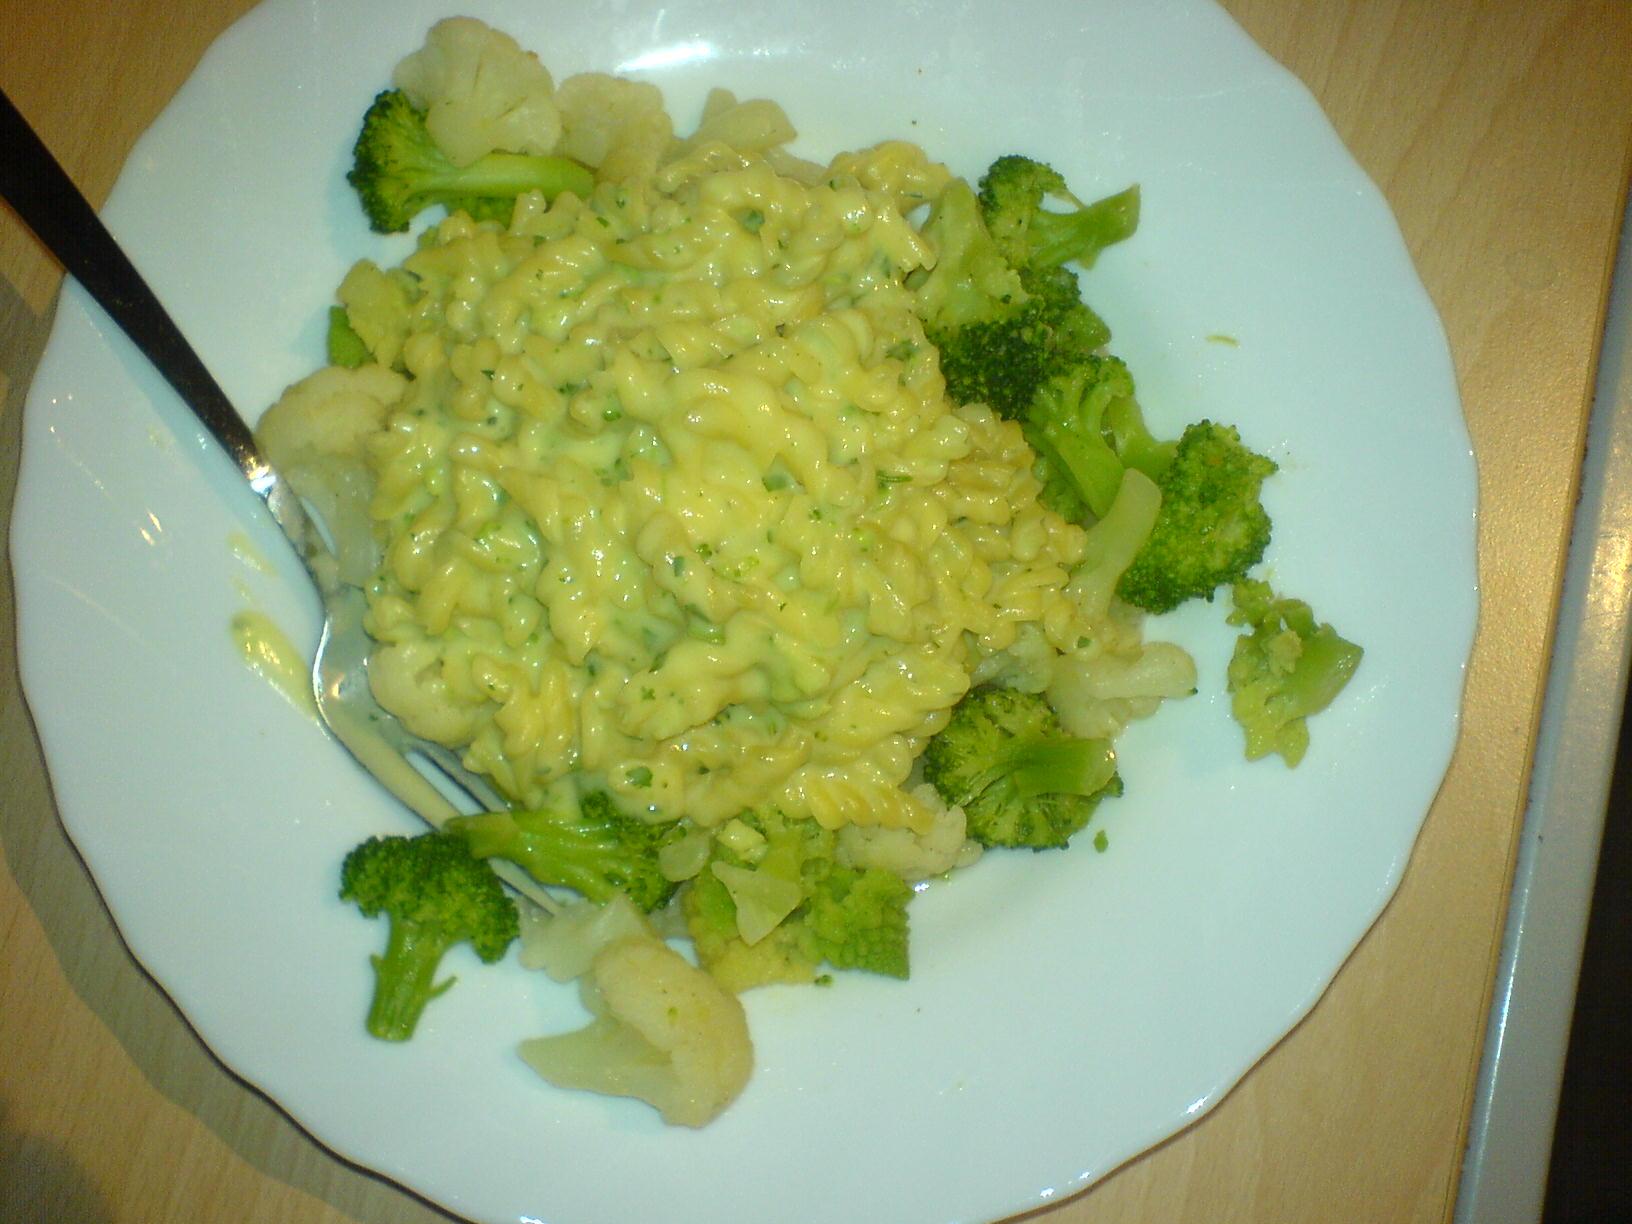 https://foodloader.net/Holz_2008-02-04_Fusilli_in_Kraeutersauce_mit_Gemuese.jpg